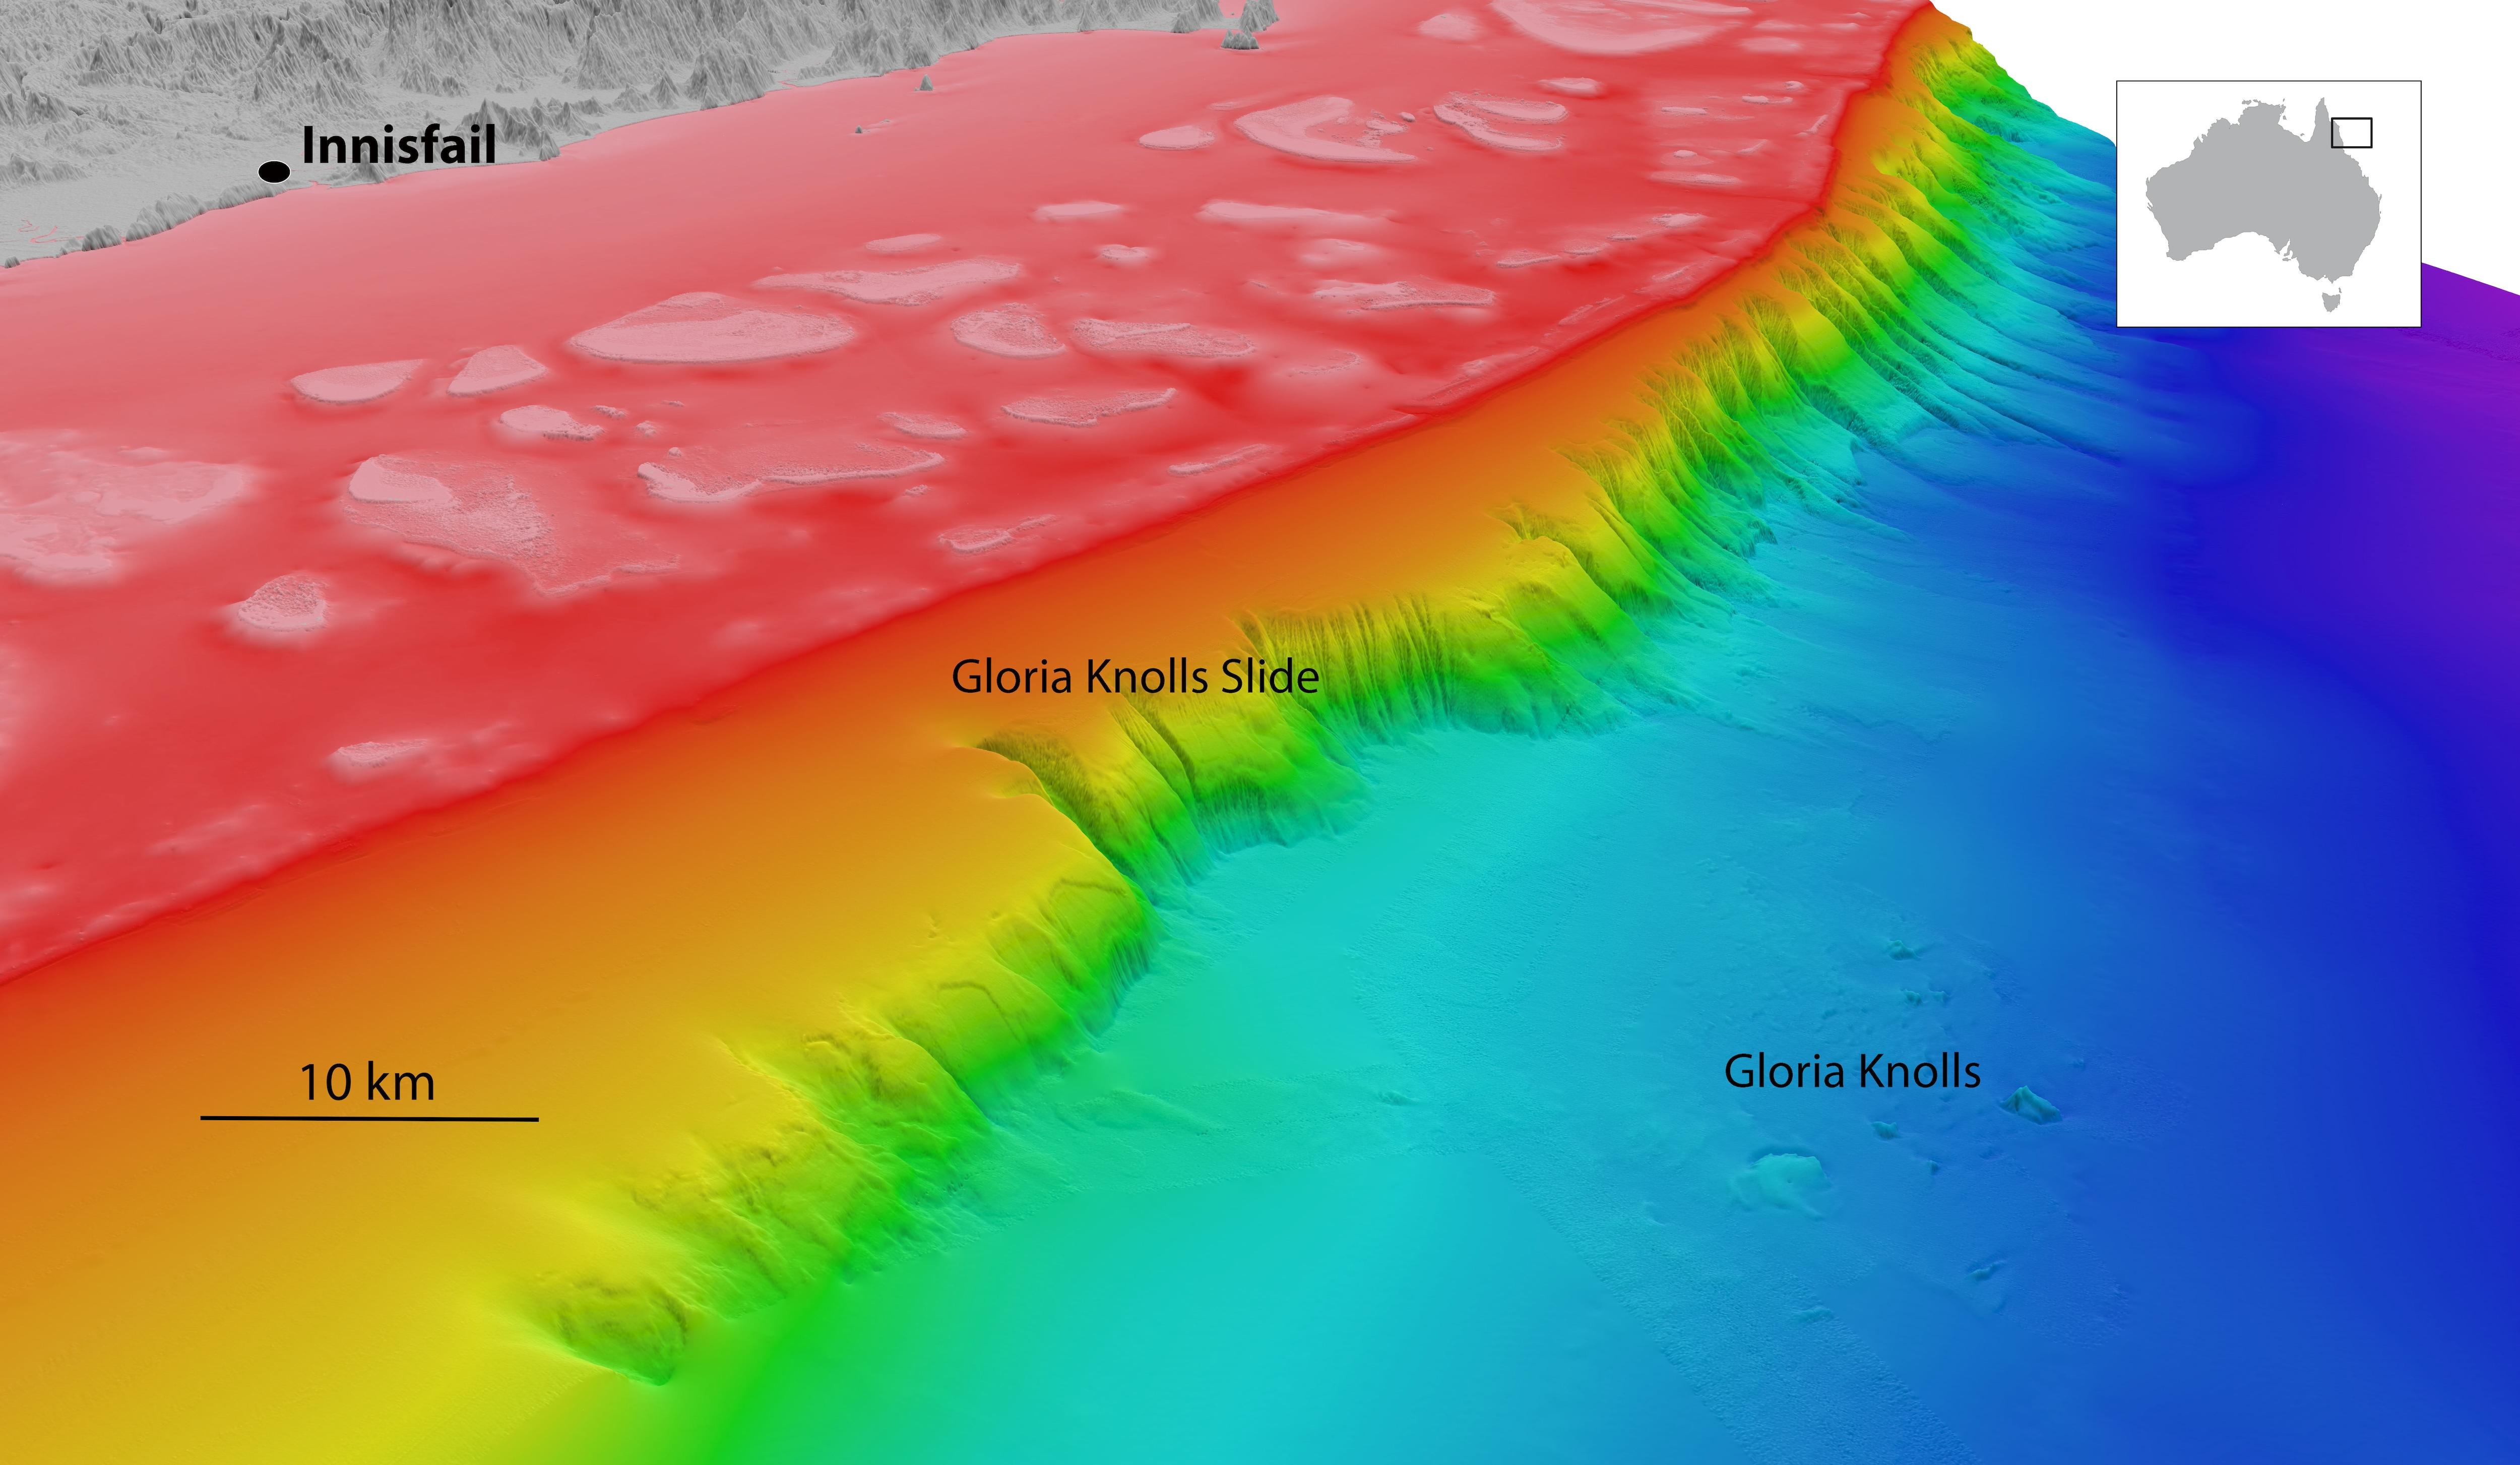 Largest Undersea Landslide Revealed On Great Barrier Reef